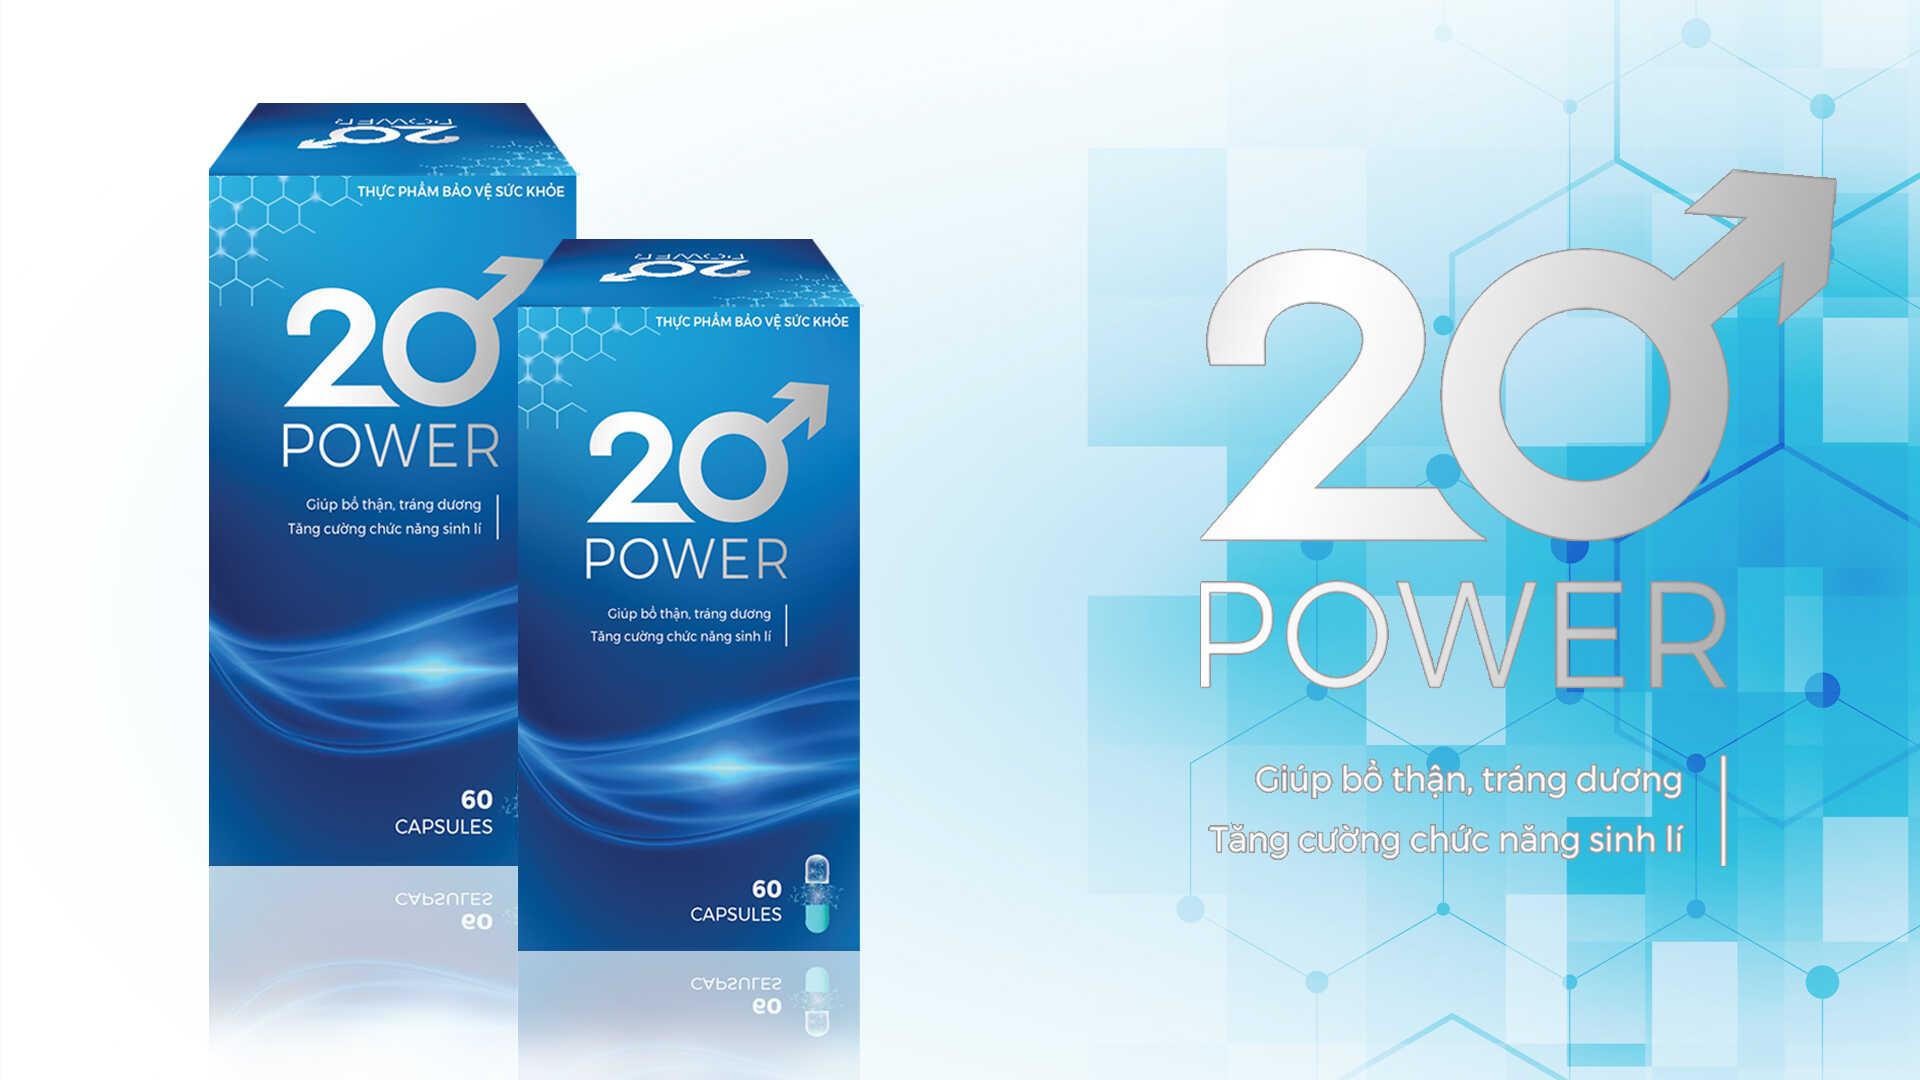 20 POWER